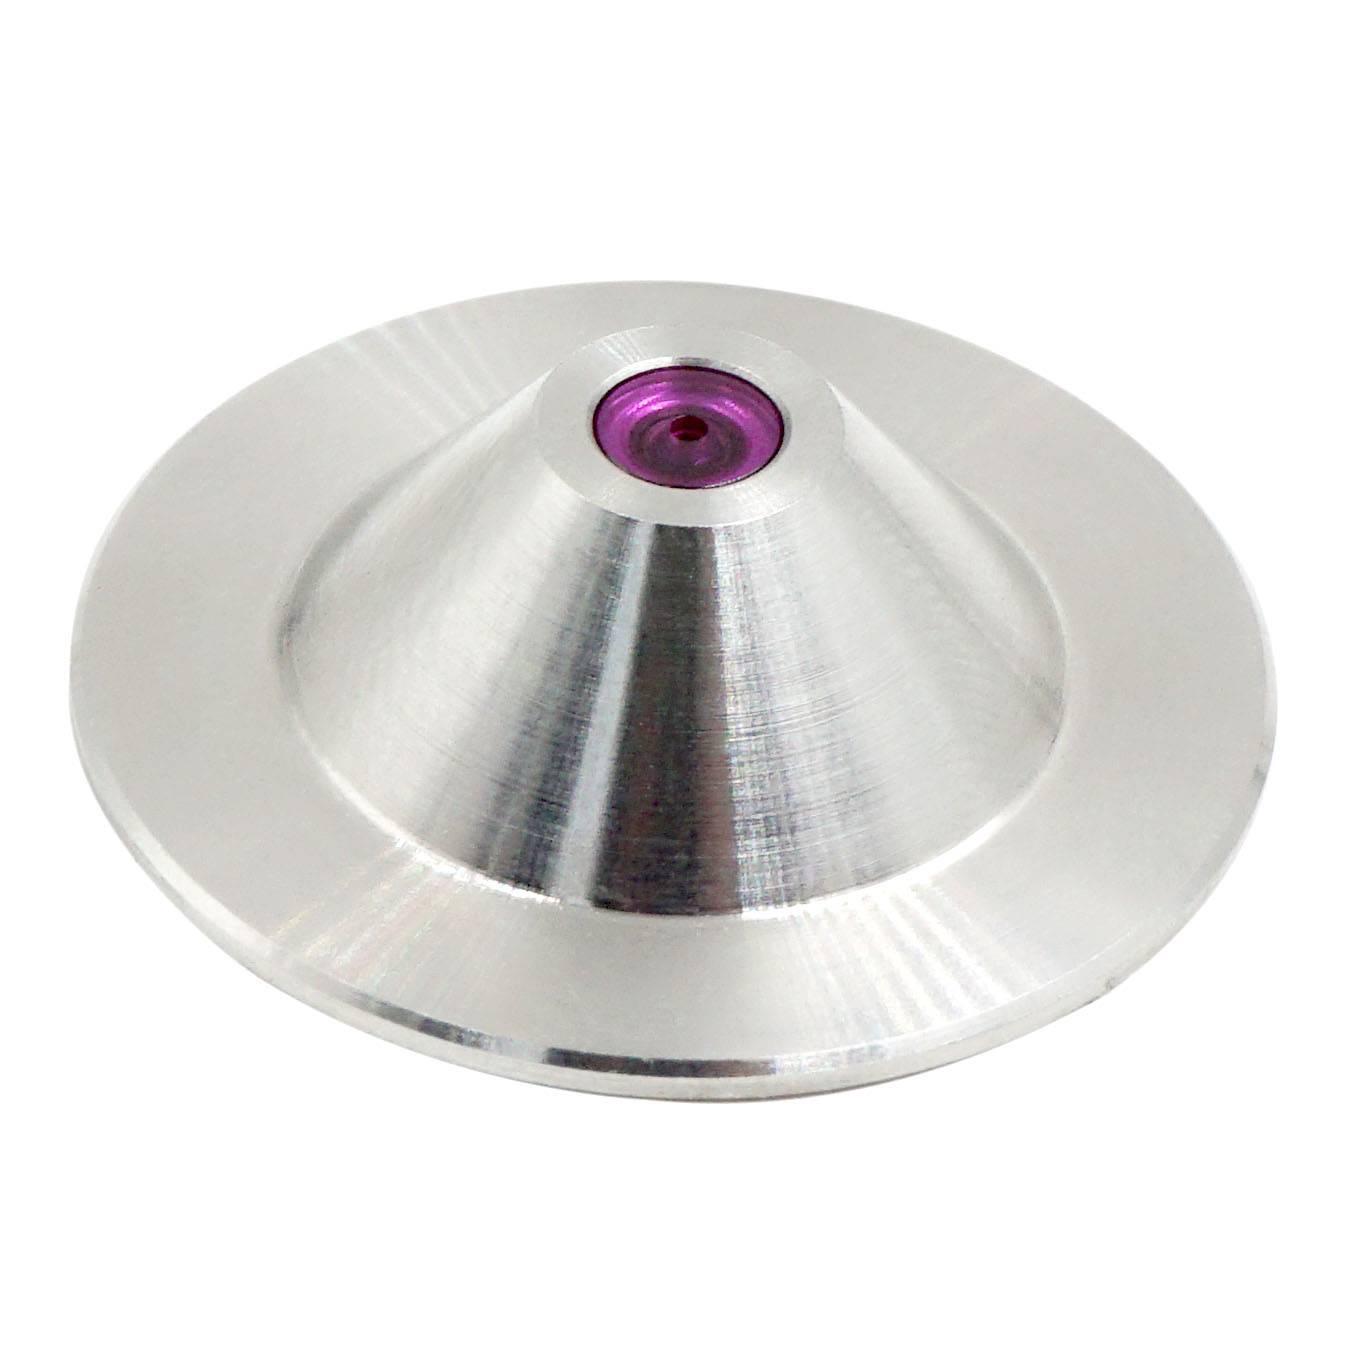 Disc Jet Ruby Nozzles